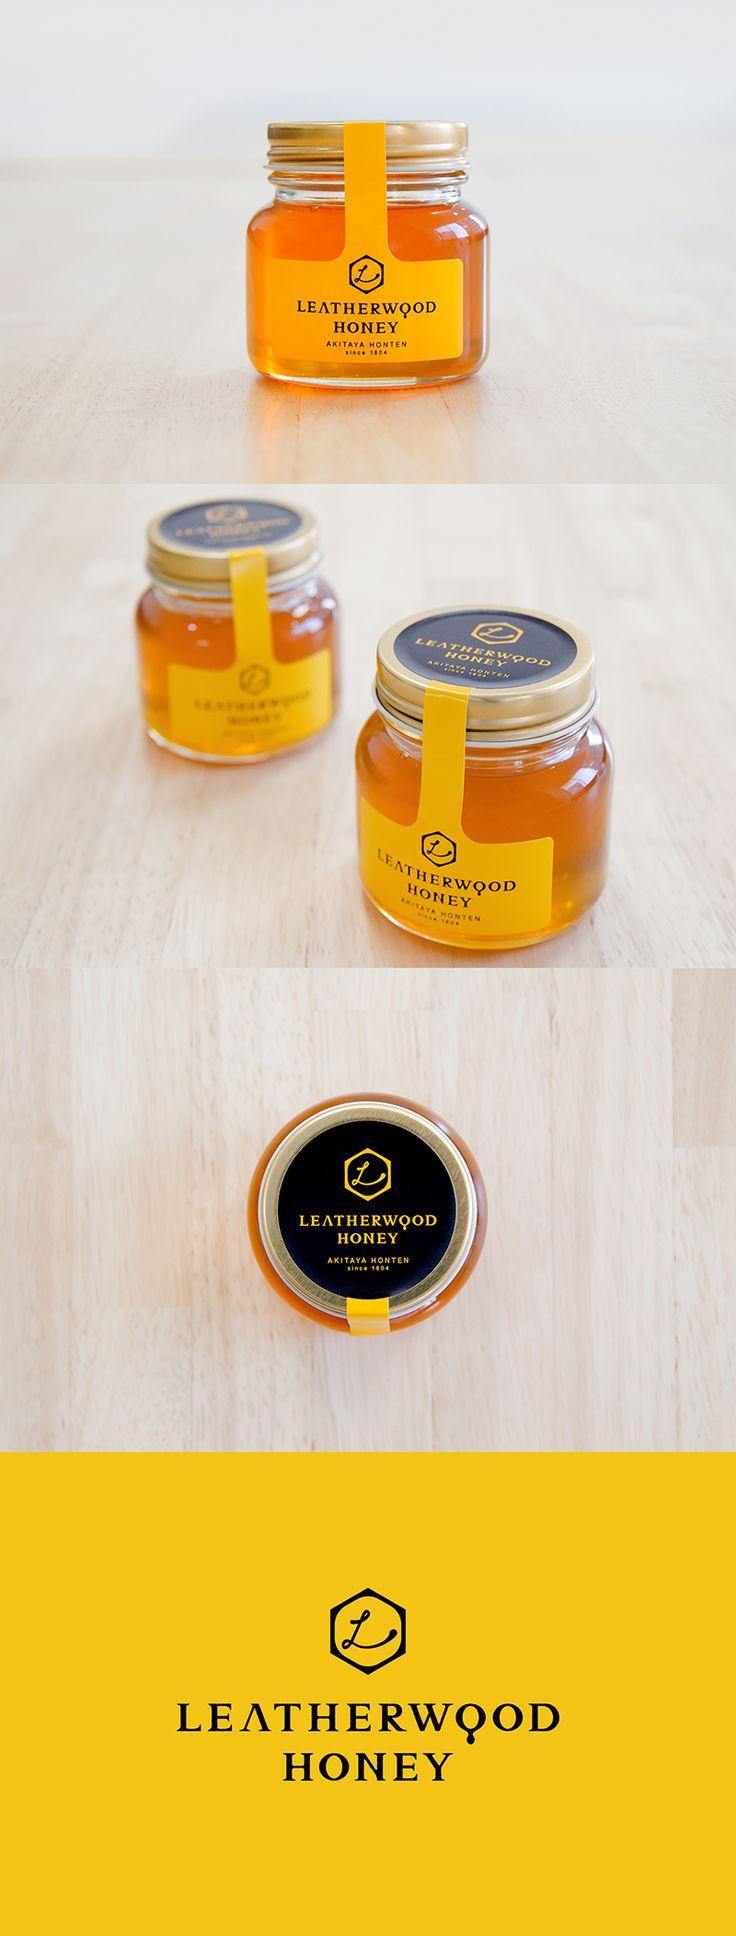 logo label design honey bottle leatherwood ロゴ ラベル デザイン はちみつ レザーウッド ビン